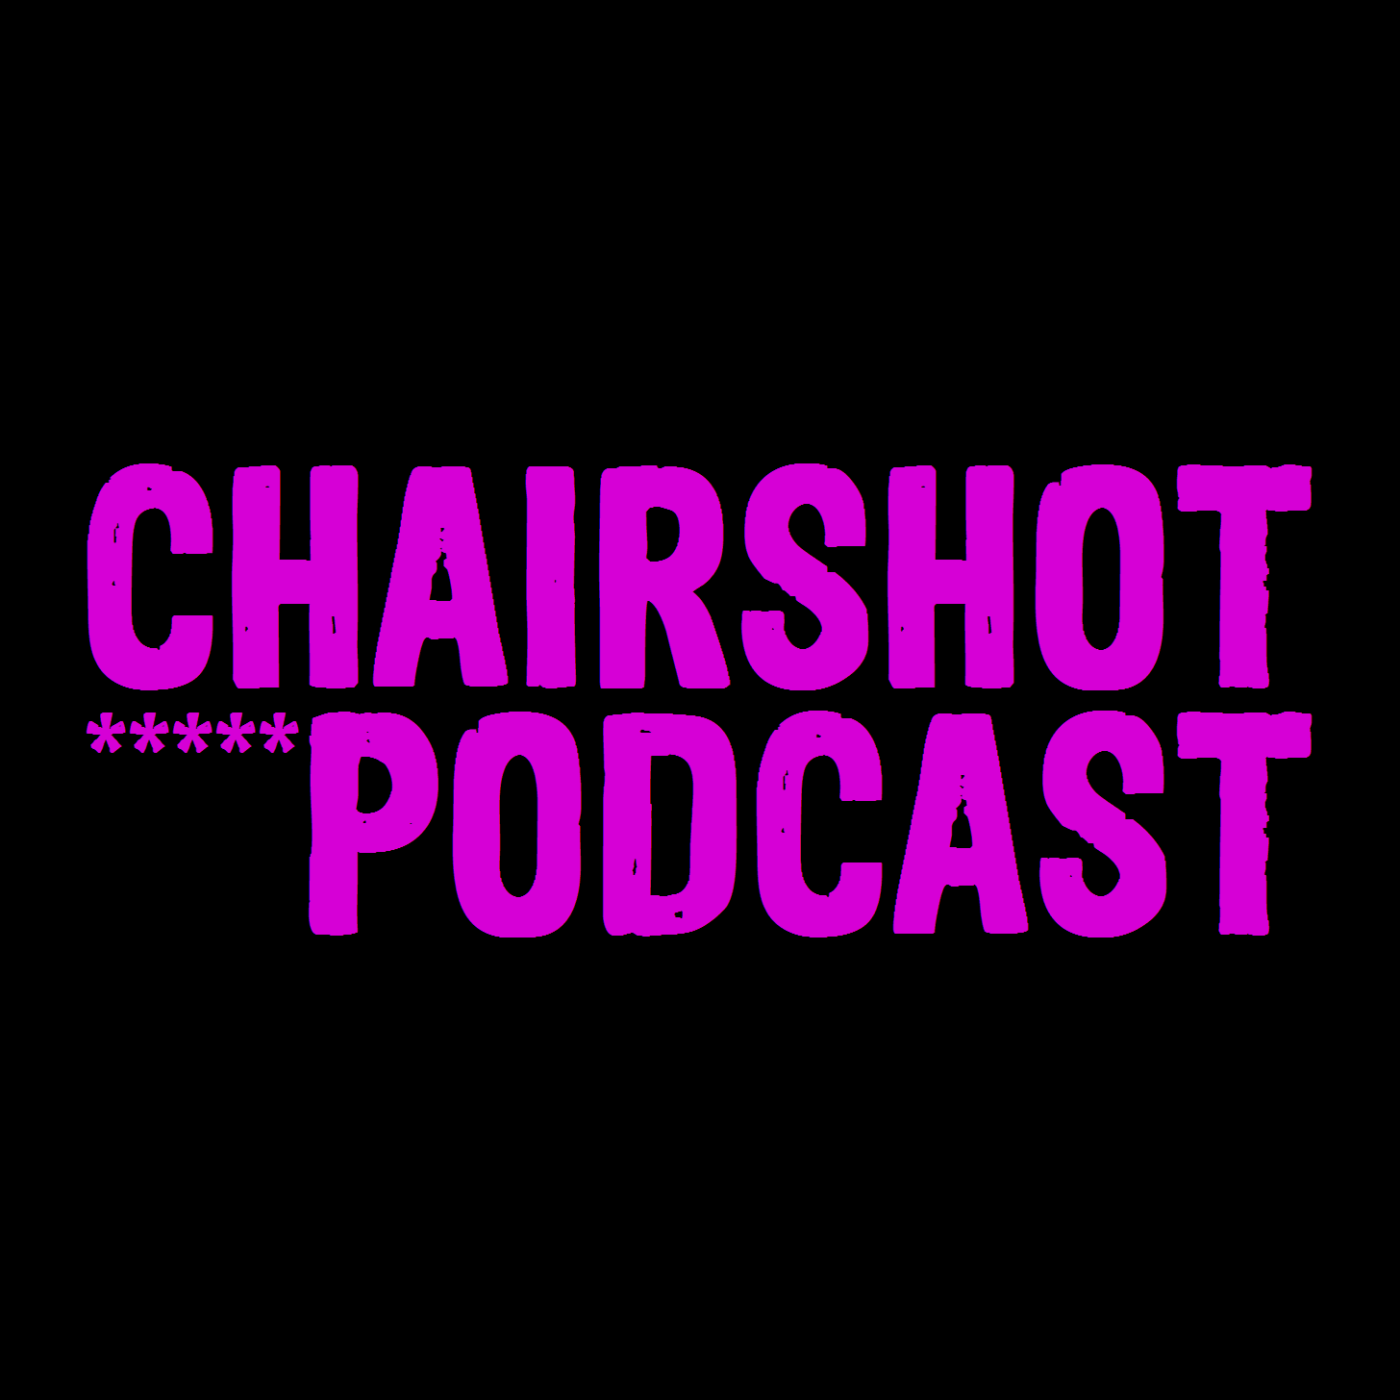 The ChairShot Podcast - The ChairShot Podcast